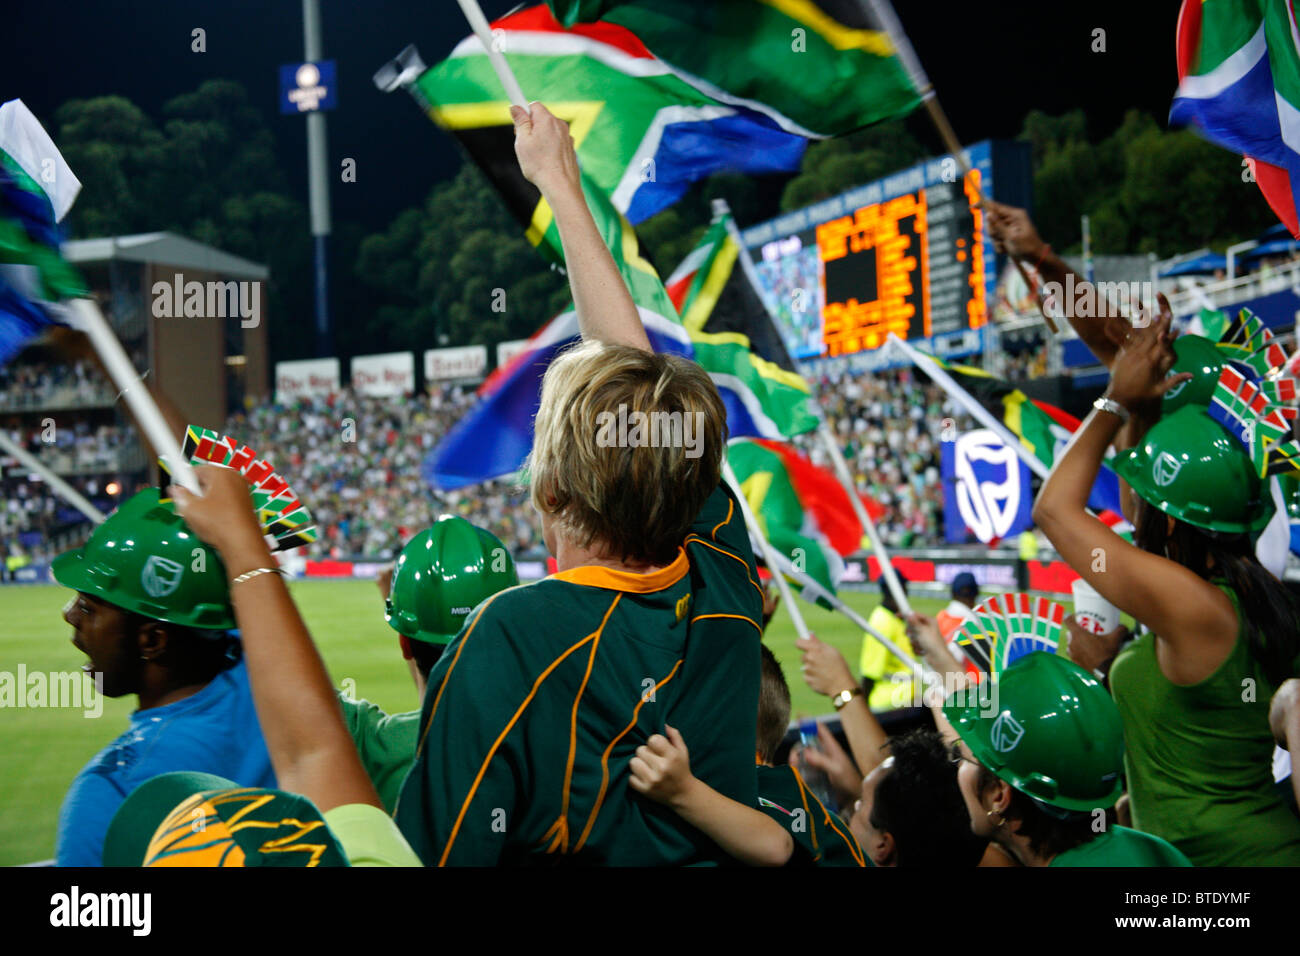 Cricket fans at a Pro20 international cricket match - Stock Image